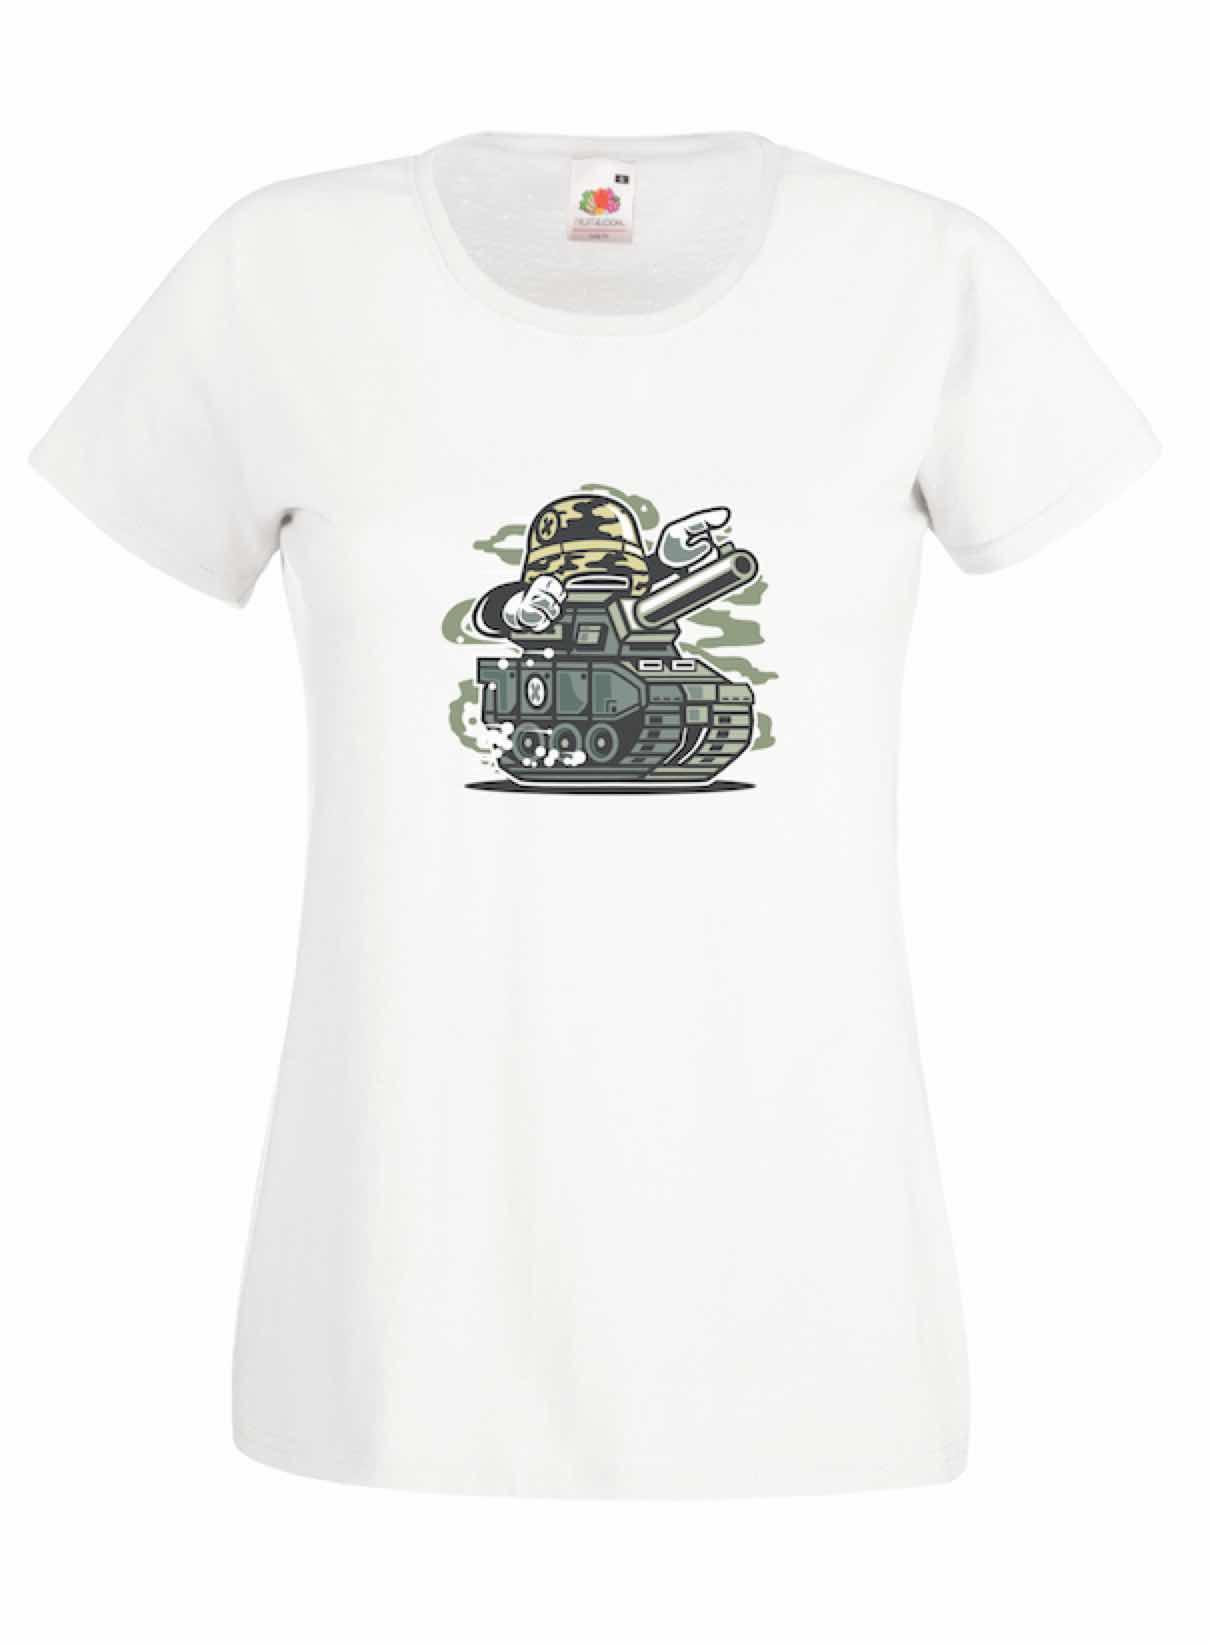 War Tank design for t-shirt, hoodie & sweatshirt